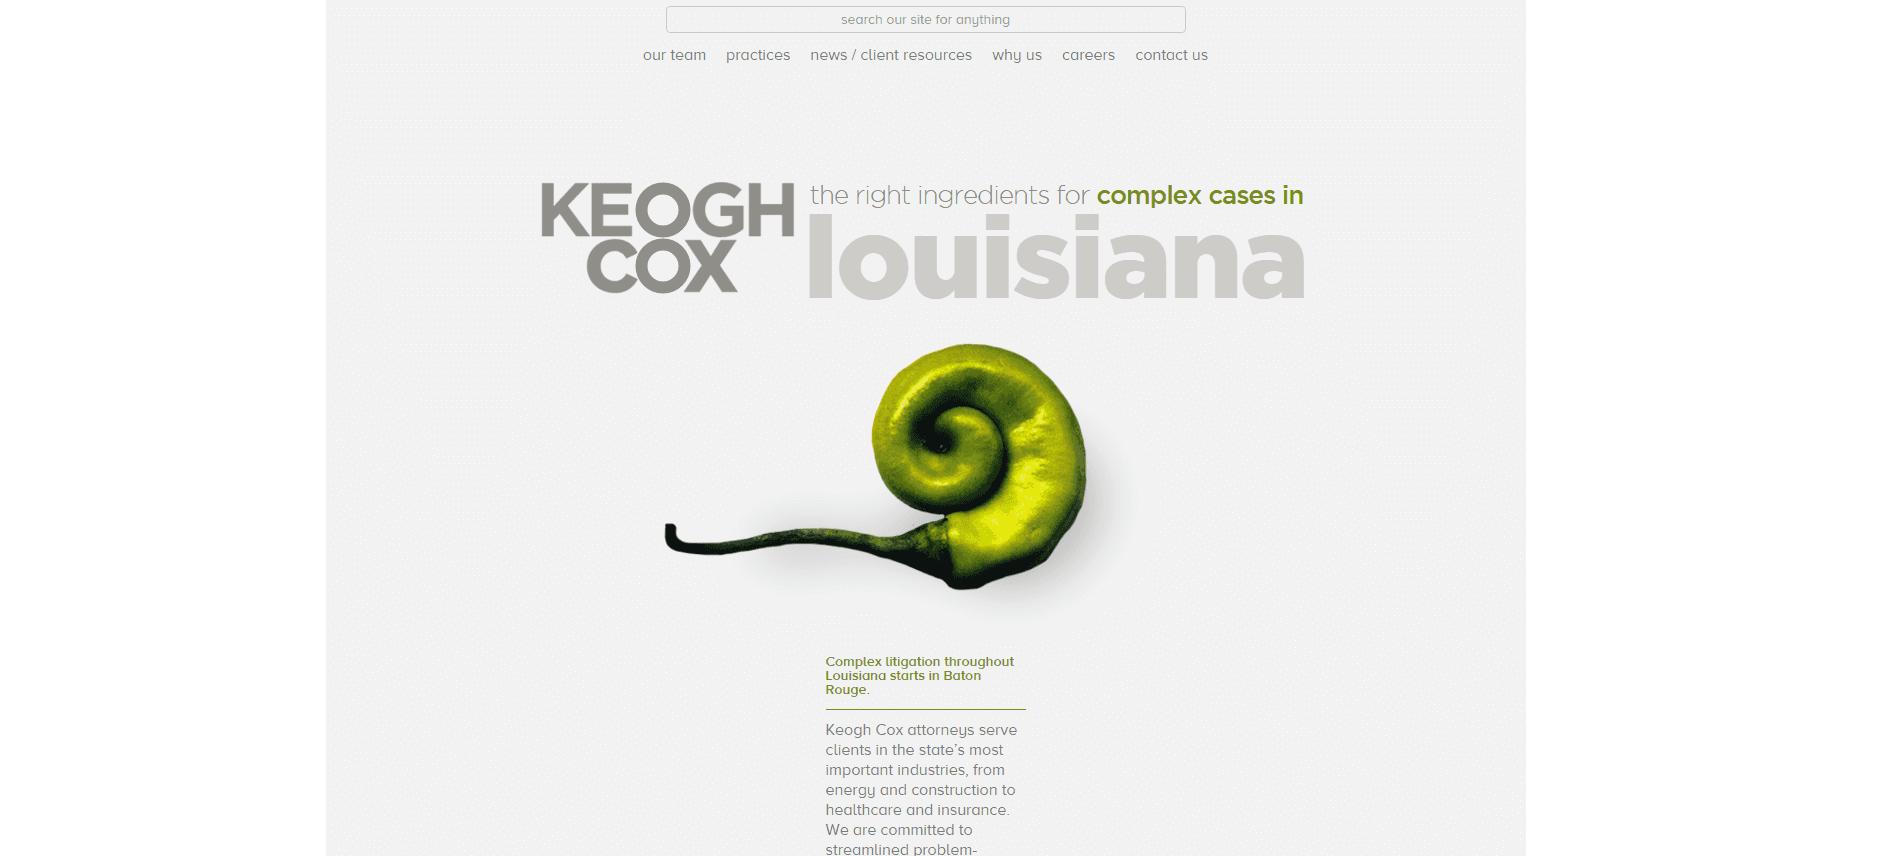 Keogh Cox Webby winning website